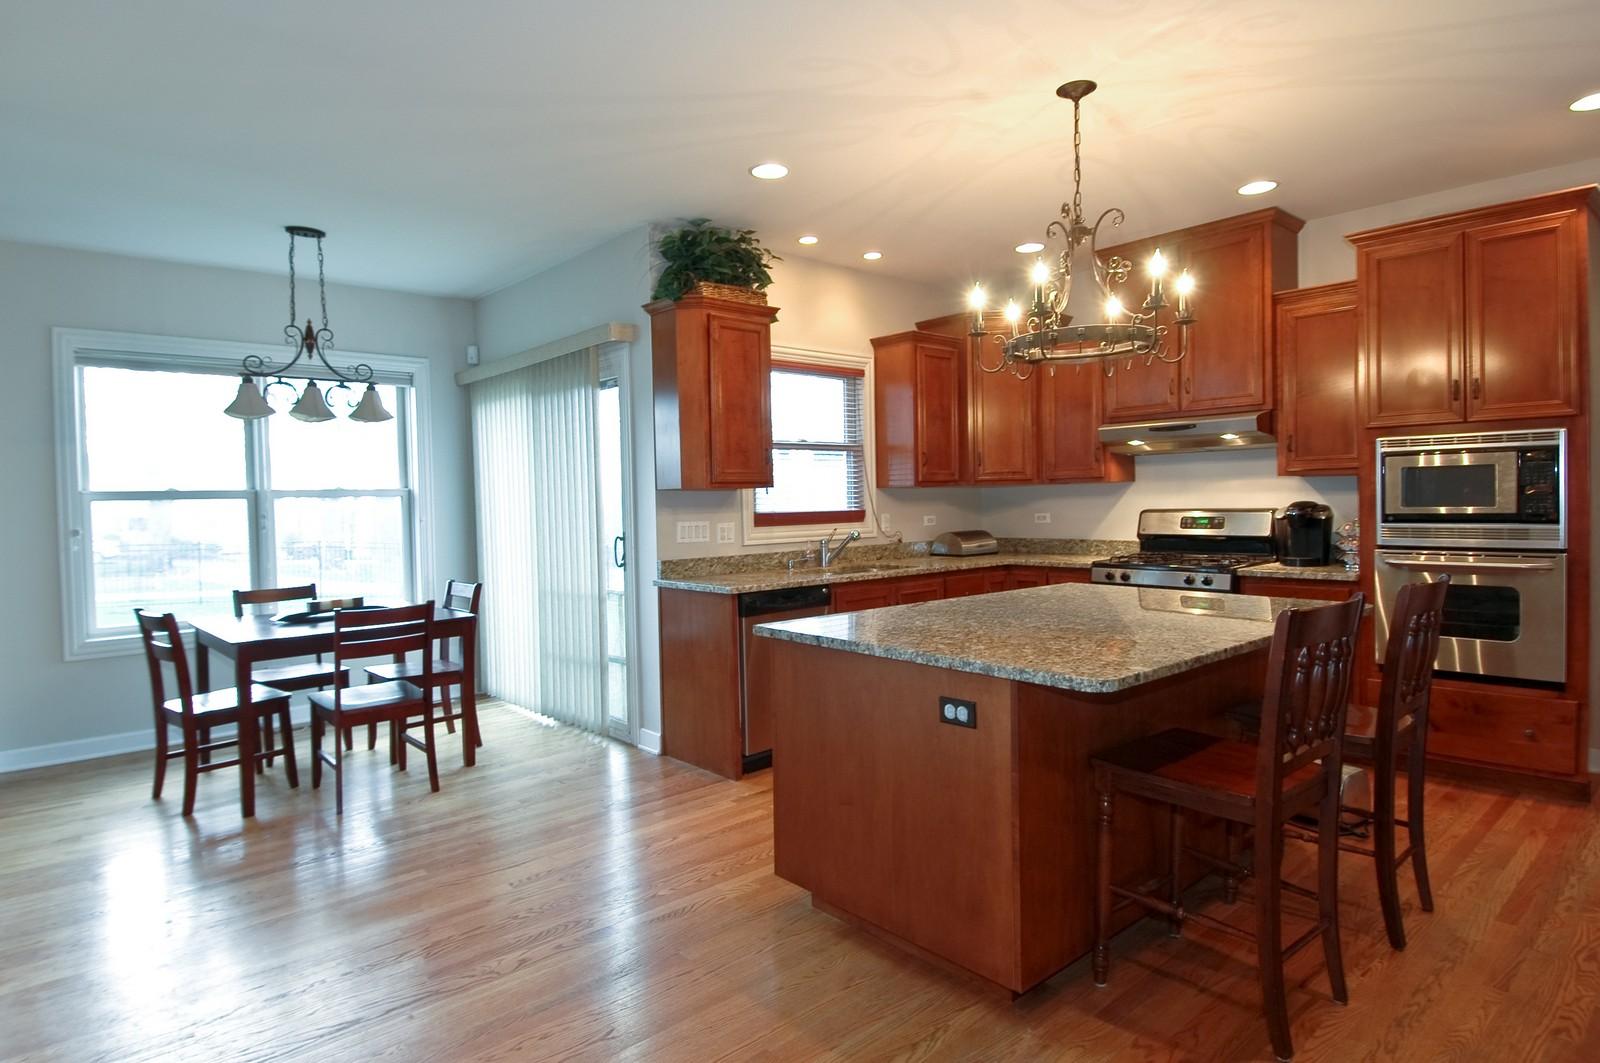 Real Estate Photography - 10575 Oakleaf Lane, Huntley, IL, 60142 - Kitchen & Eating Area